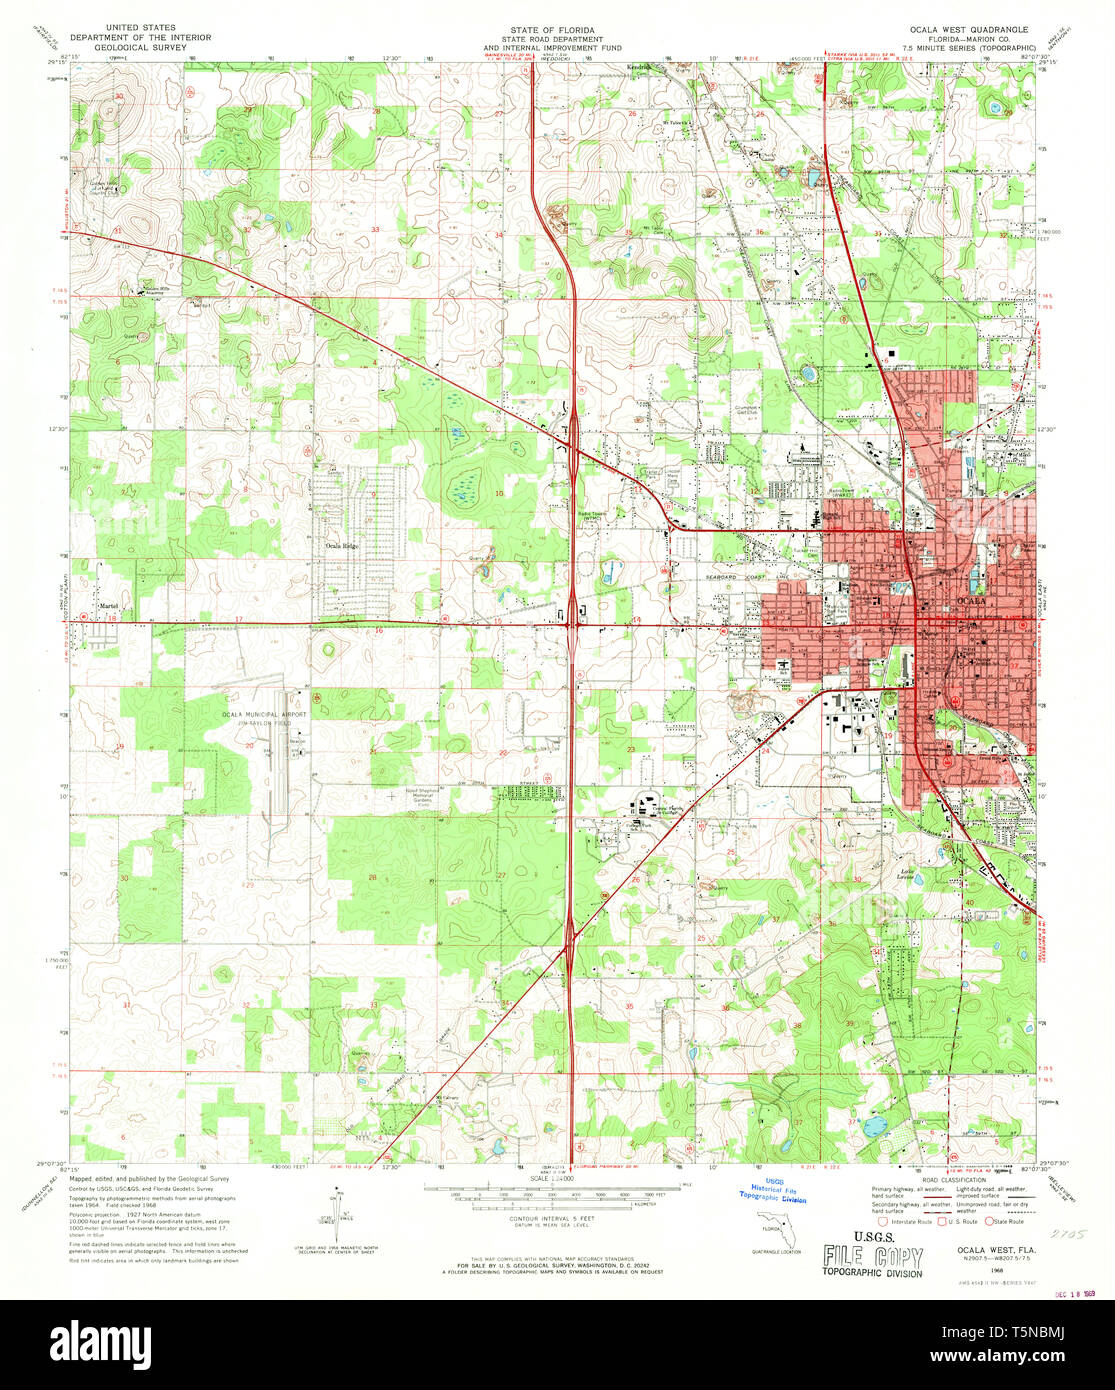 Map Of Ocala Florida on map of chokoloskee florida, map of saint lucie florida, map of dover florida, map of south gulf cove florida, map of ft. walton florida, map of port of miami florida, map of orlando florida, map of ruskin florida, map of the acreage florida, full large map of florida, map of coconut grove florida, map of lakeland florida, map of indian creek florida, map of tampa florida, map of everglades florida, map of lawtey florida, map of gainesville florida, map of micco florida, map of orange springs florida, map of davie florida,